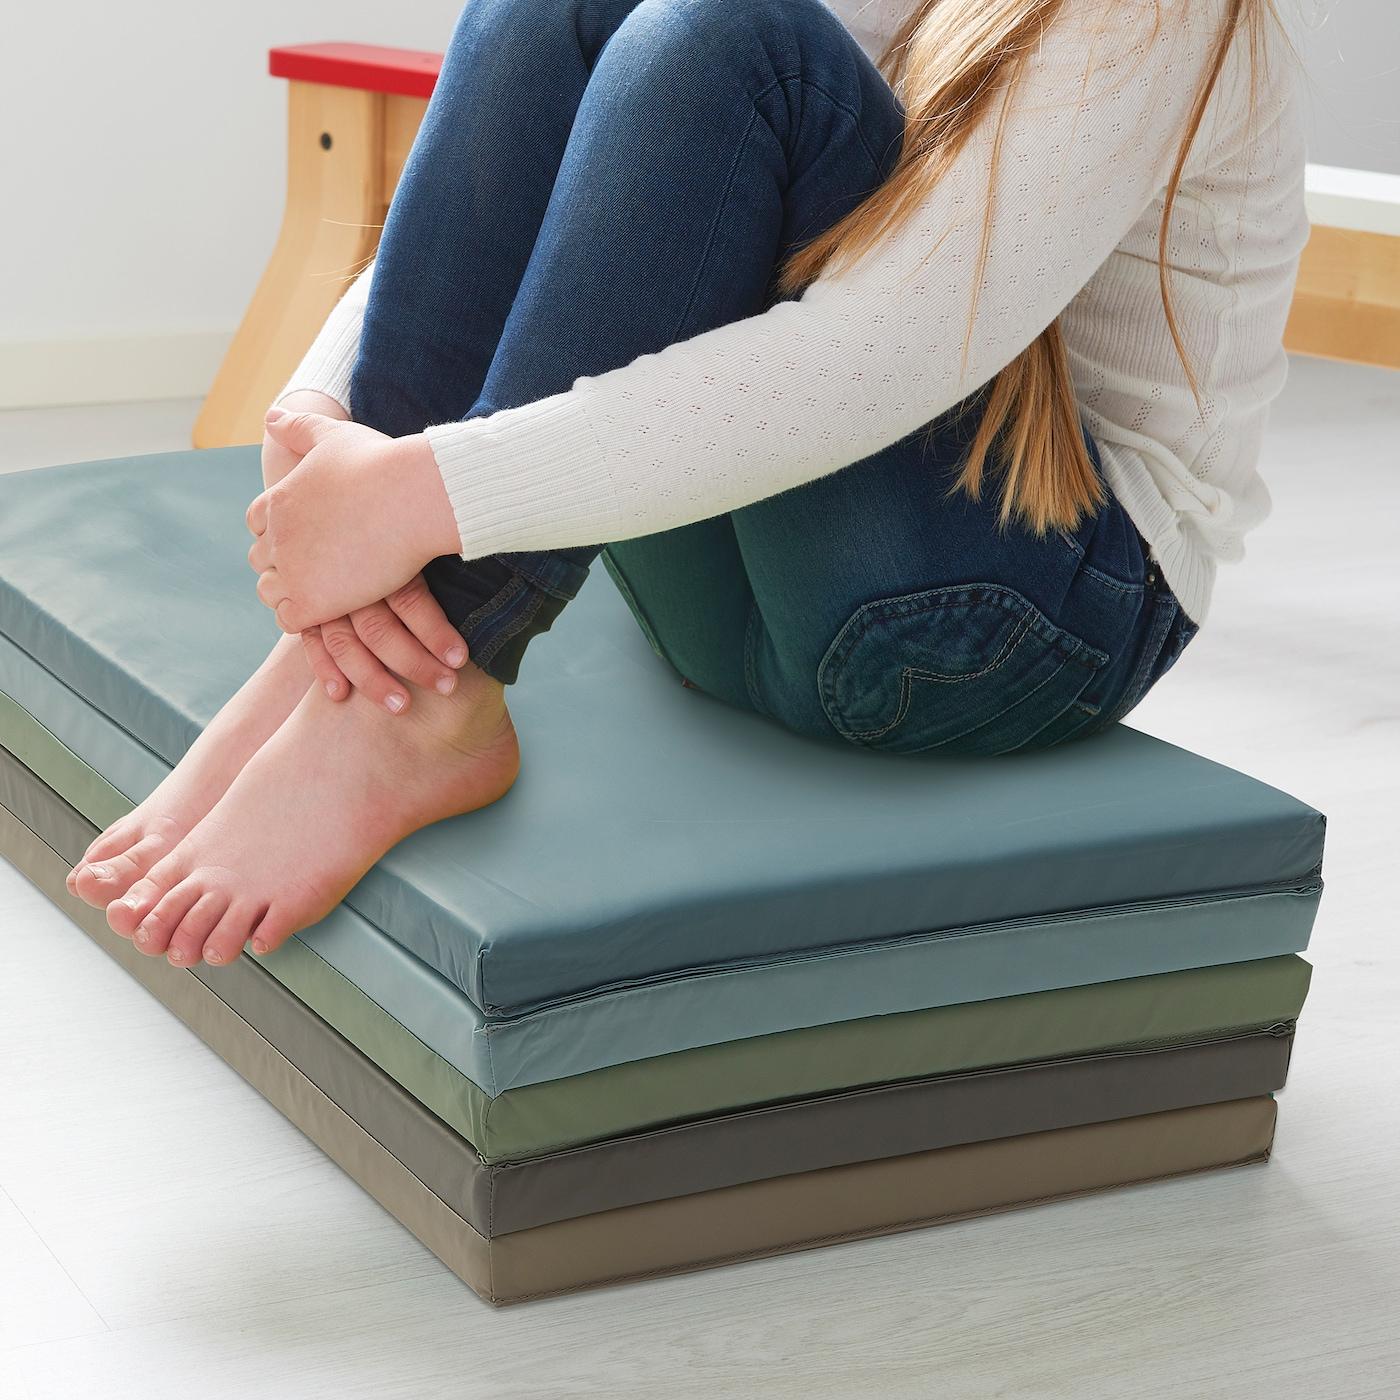 PLUFSIG folding gym mat blue 185 cm 78 cm 3.2 cm